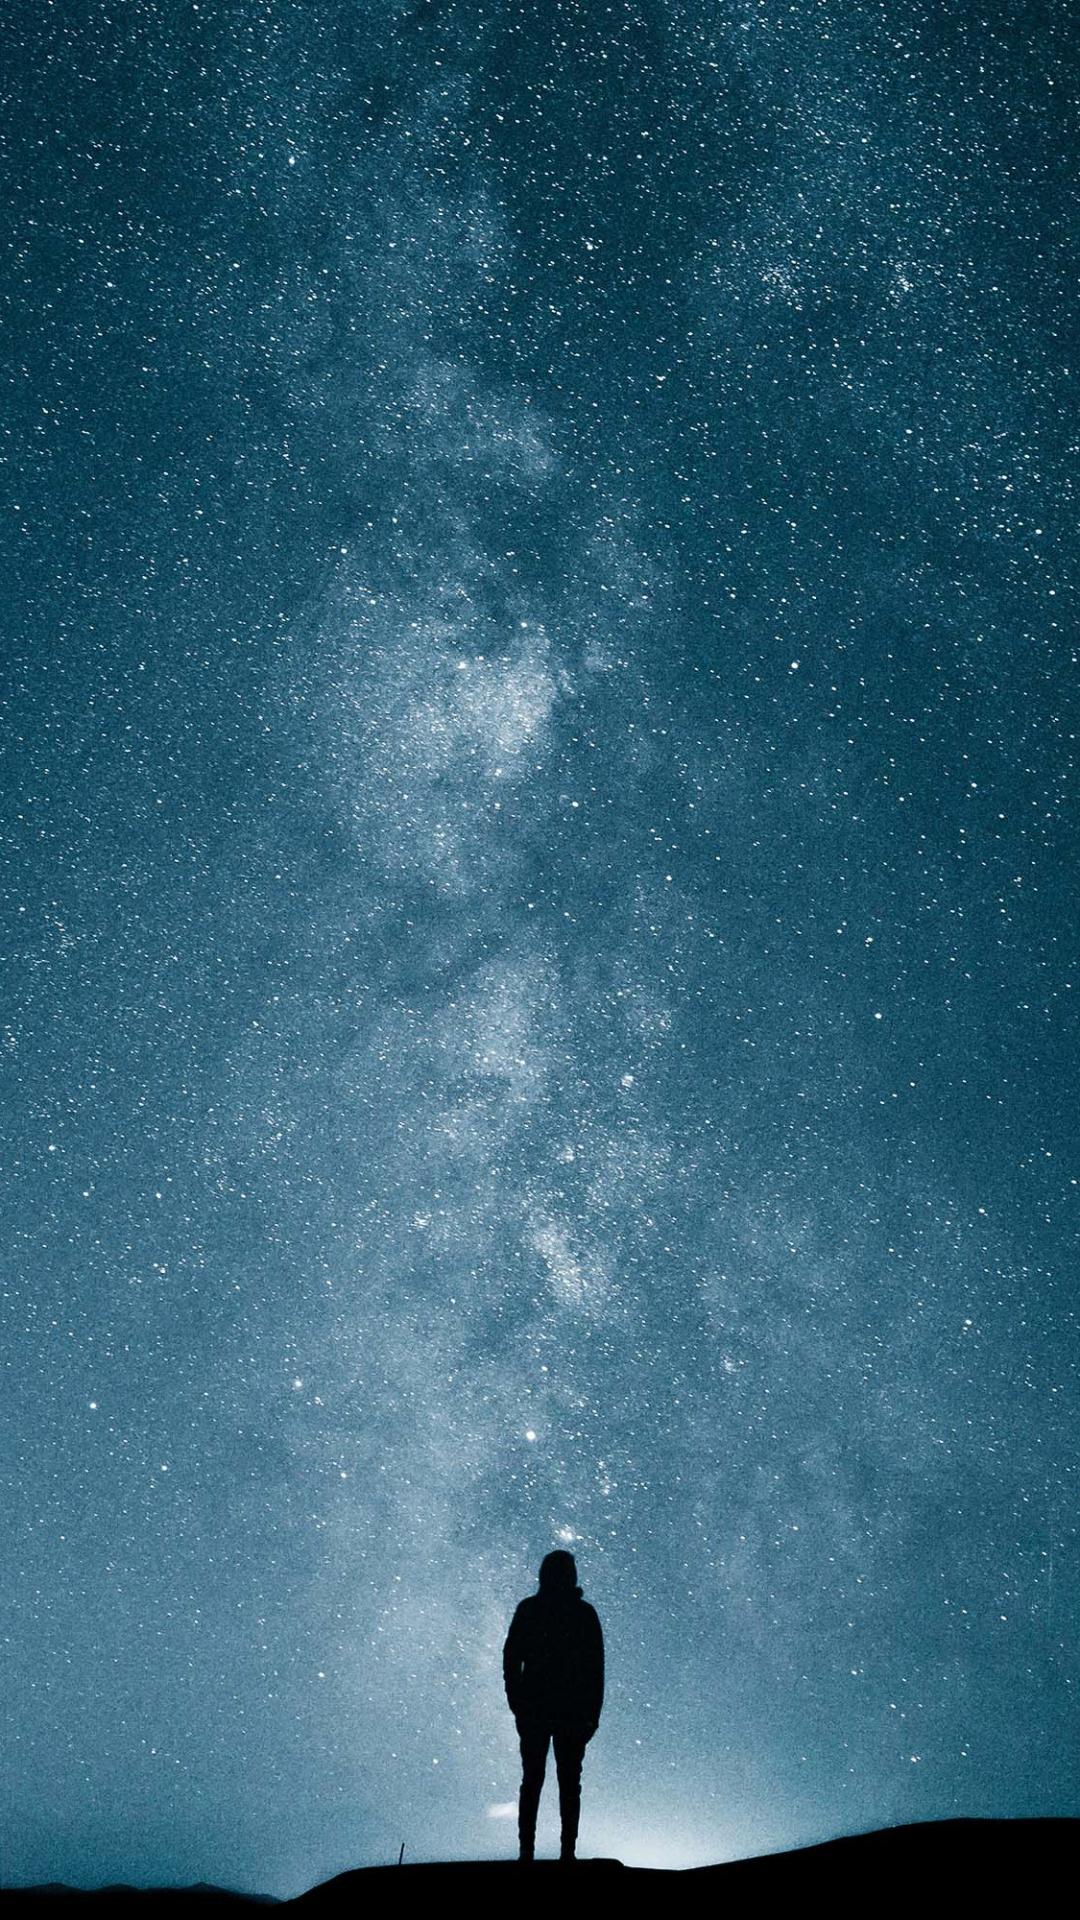 Galaxy Wallpaper 4k Phone 1080x1920 Wallpaper Teahub Io